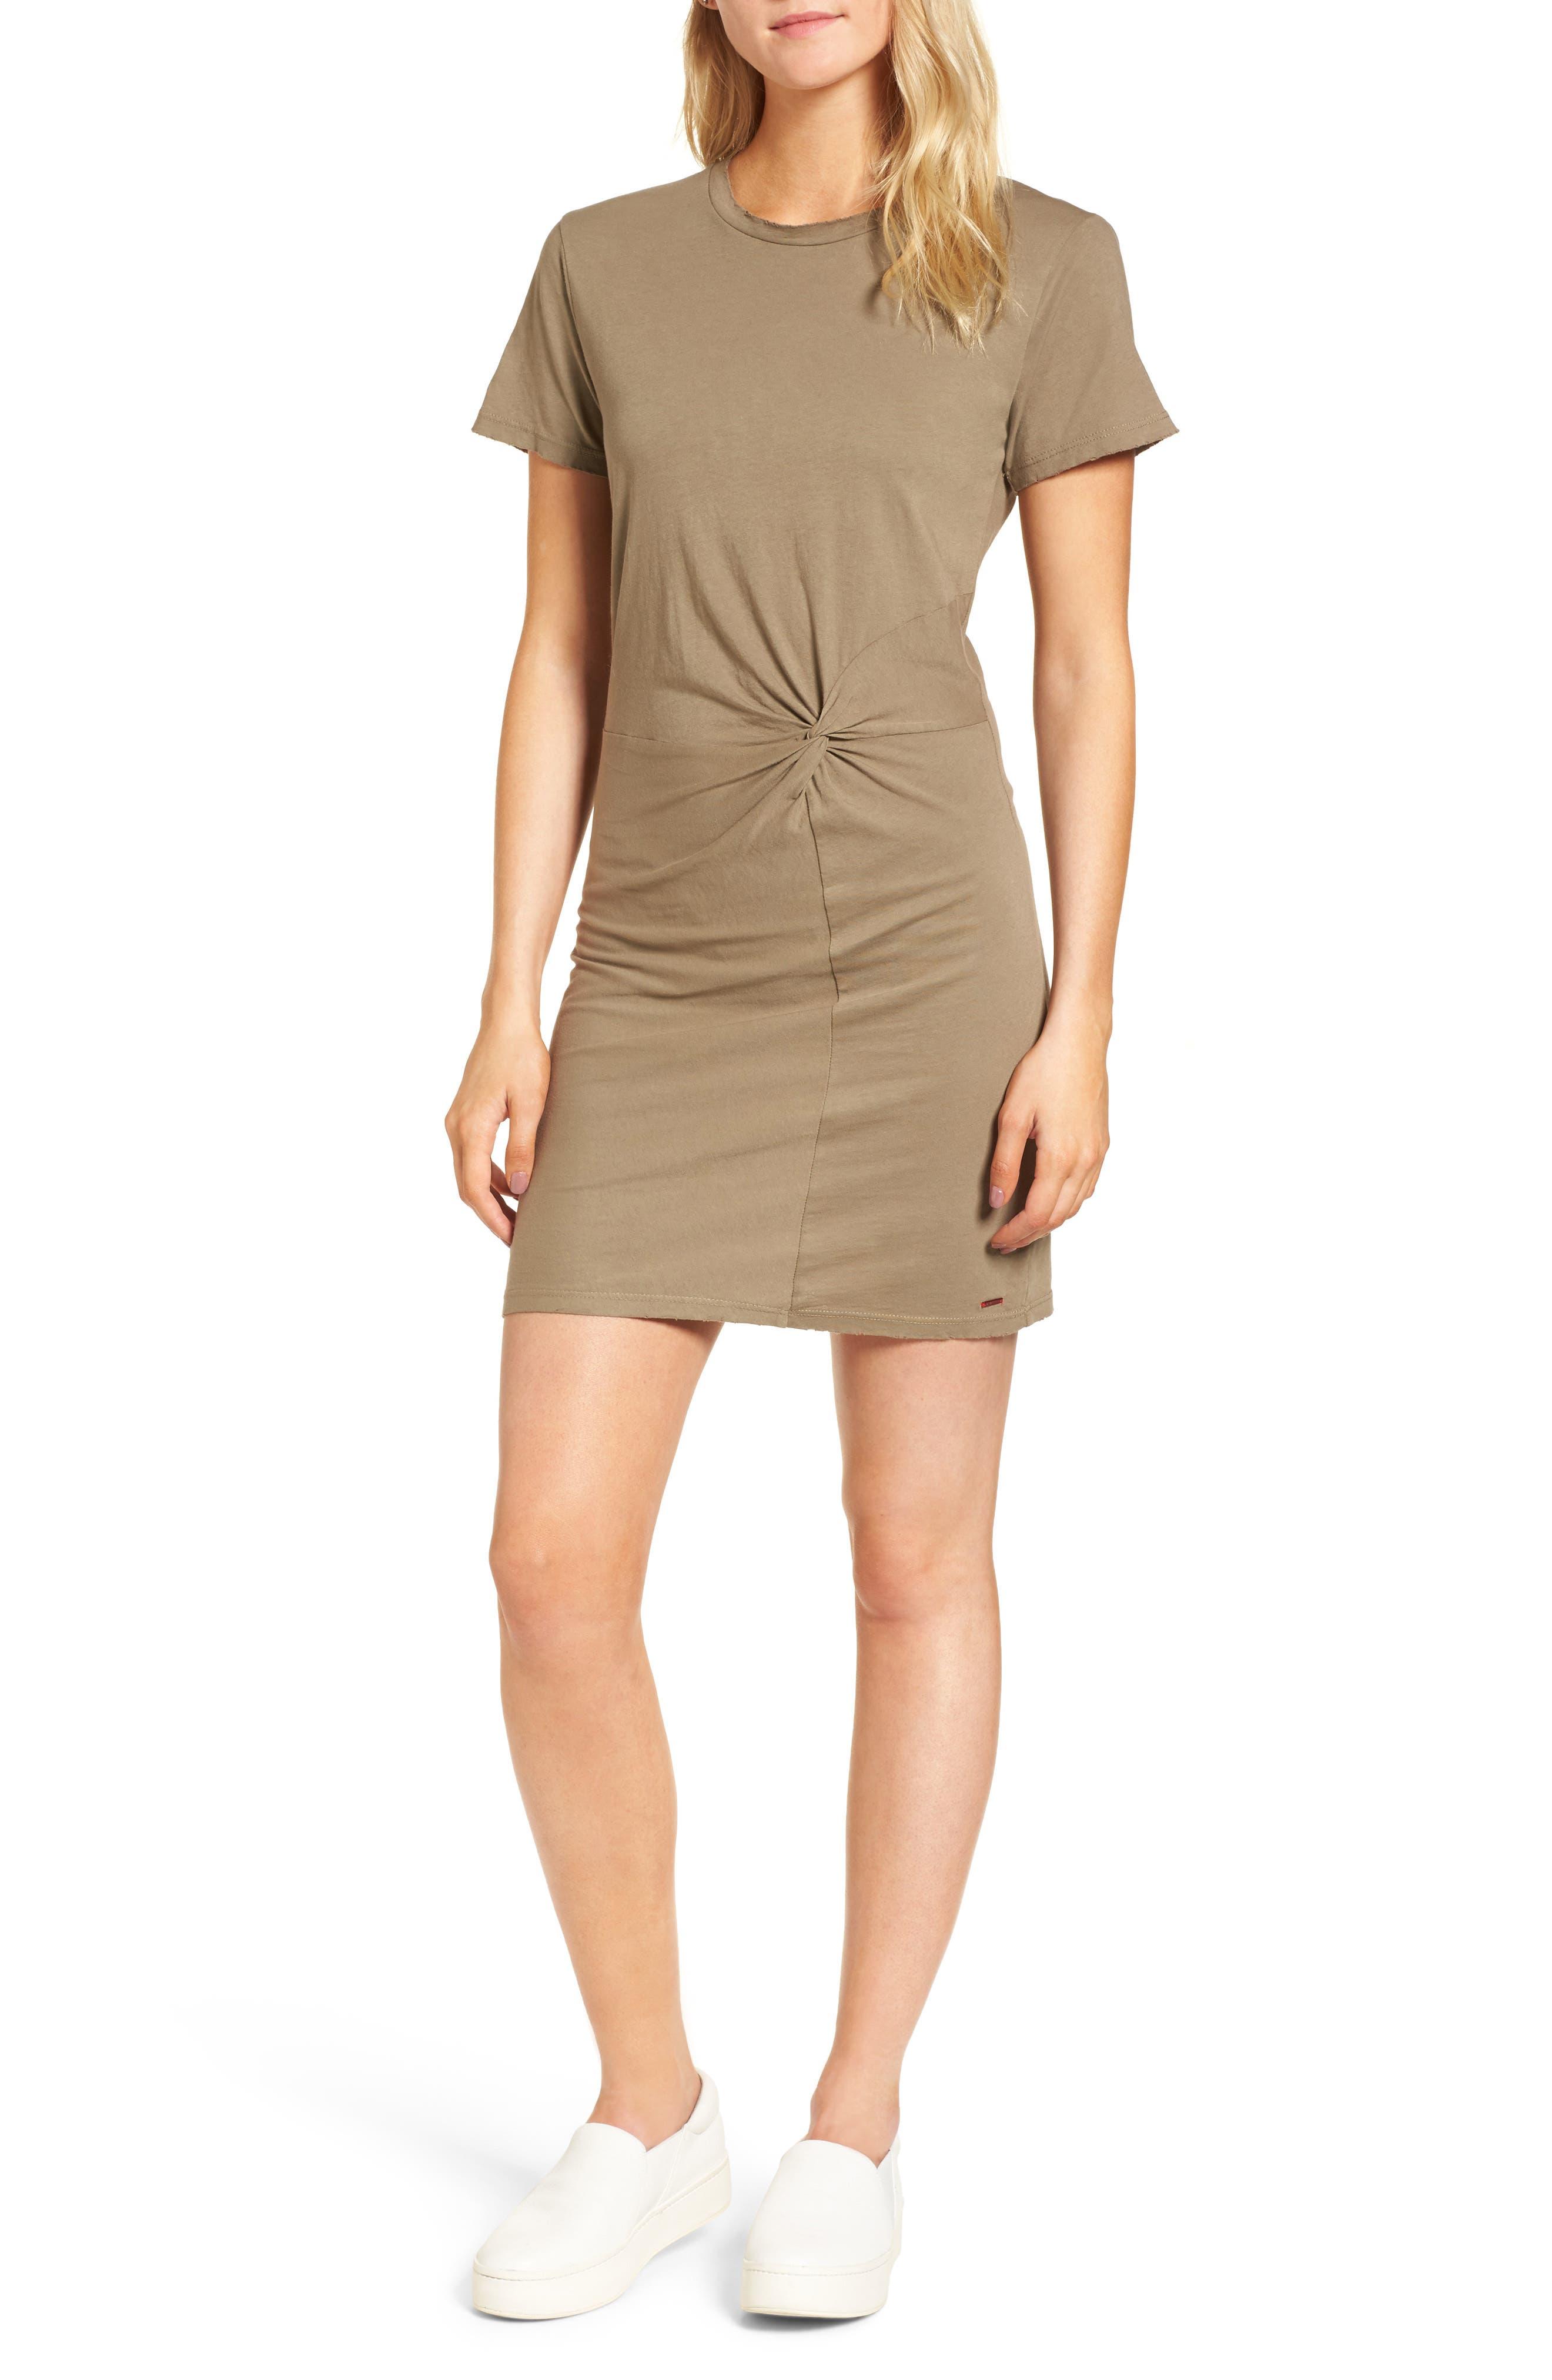 Alternate Image 1 Selected - n:PHILANTHROPY Jazz Knotted T-Shirt Dress